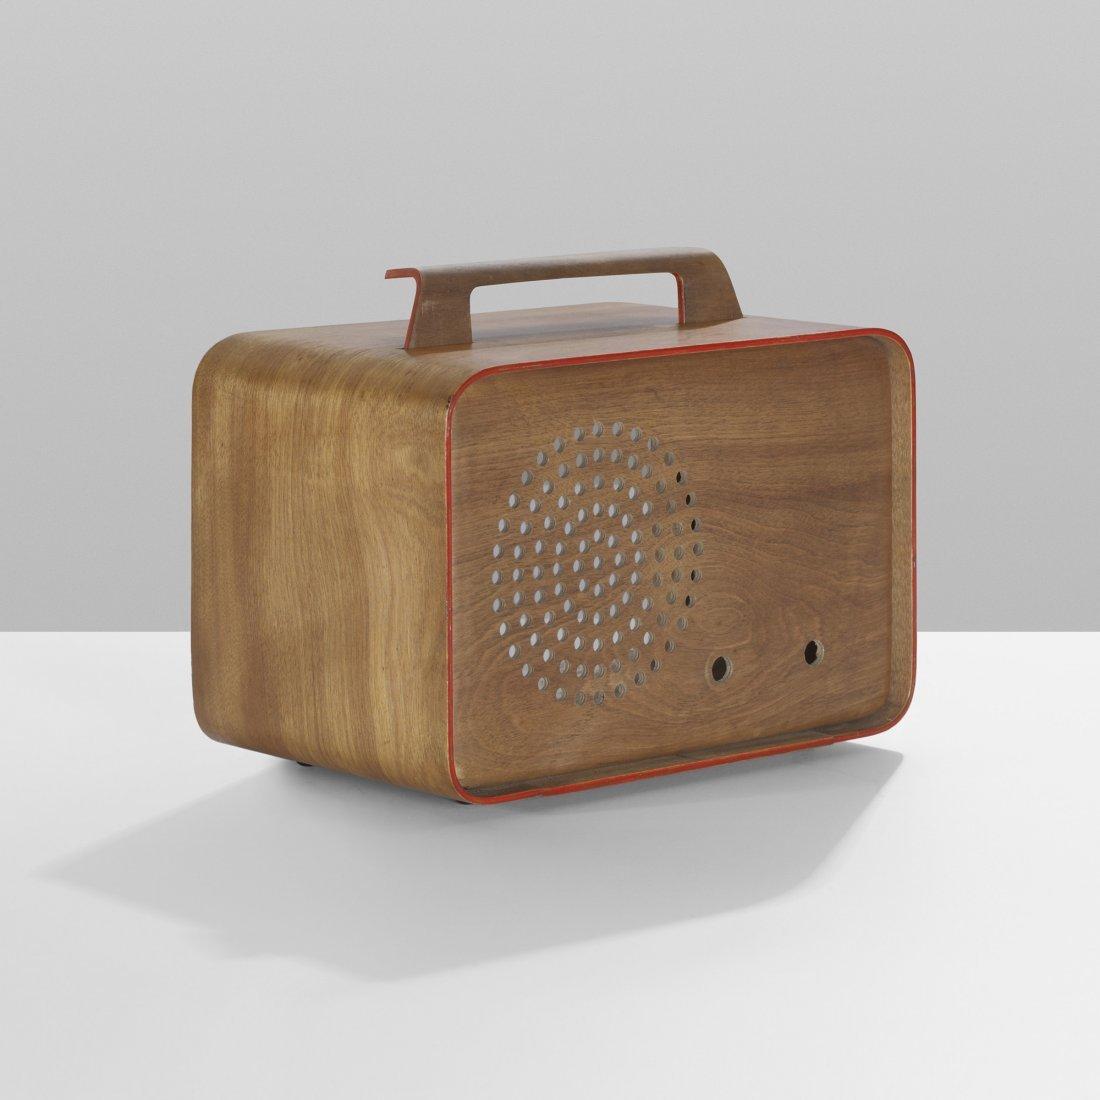 117: Charles Eames prototype radio enclosure